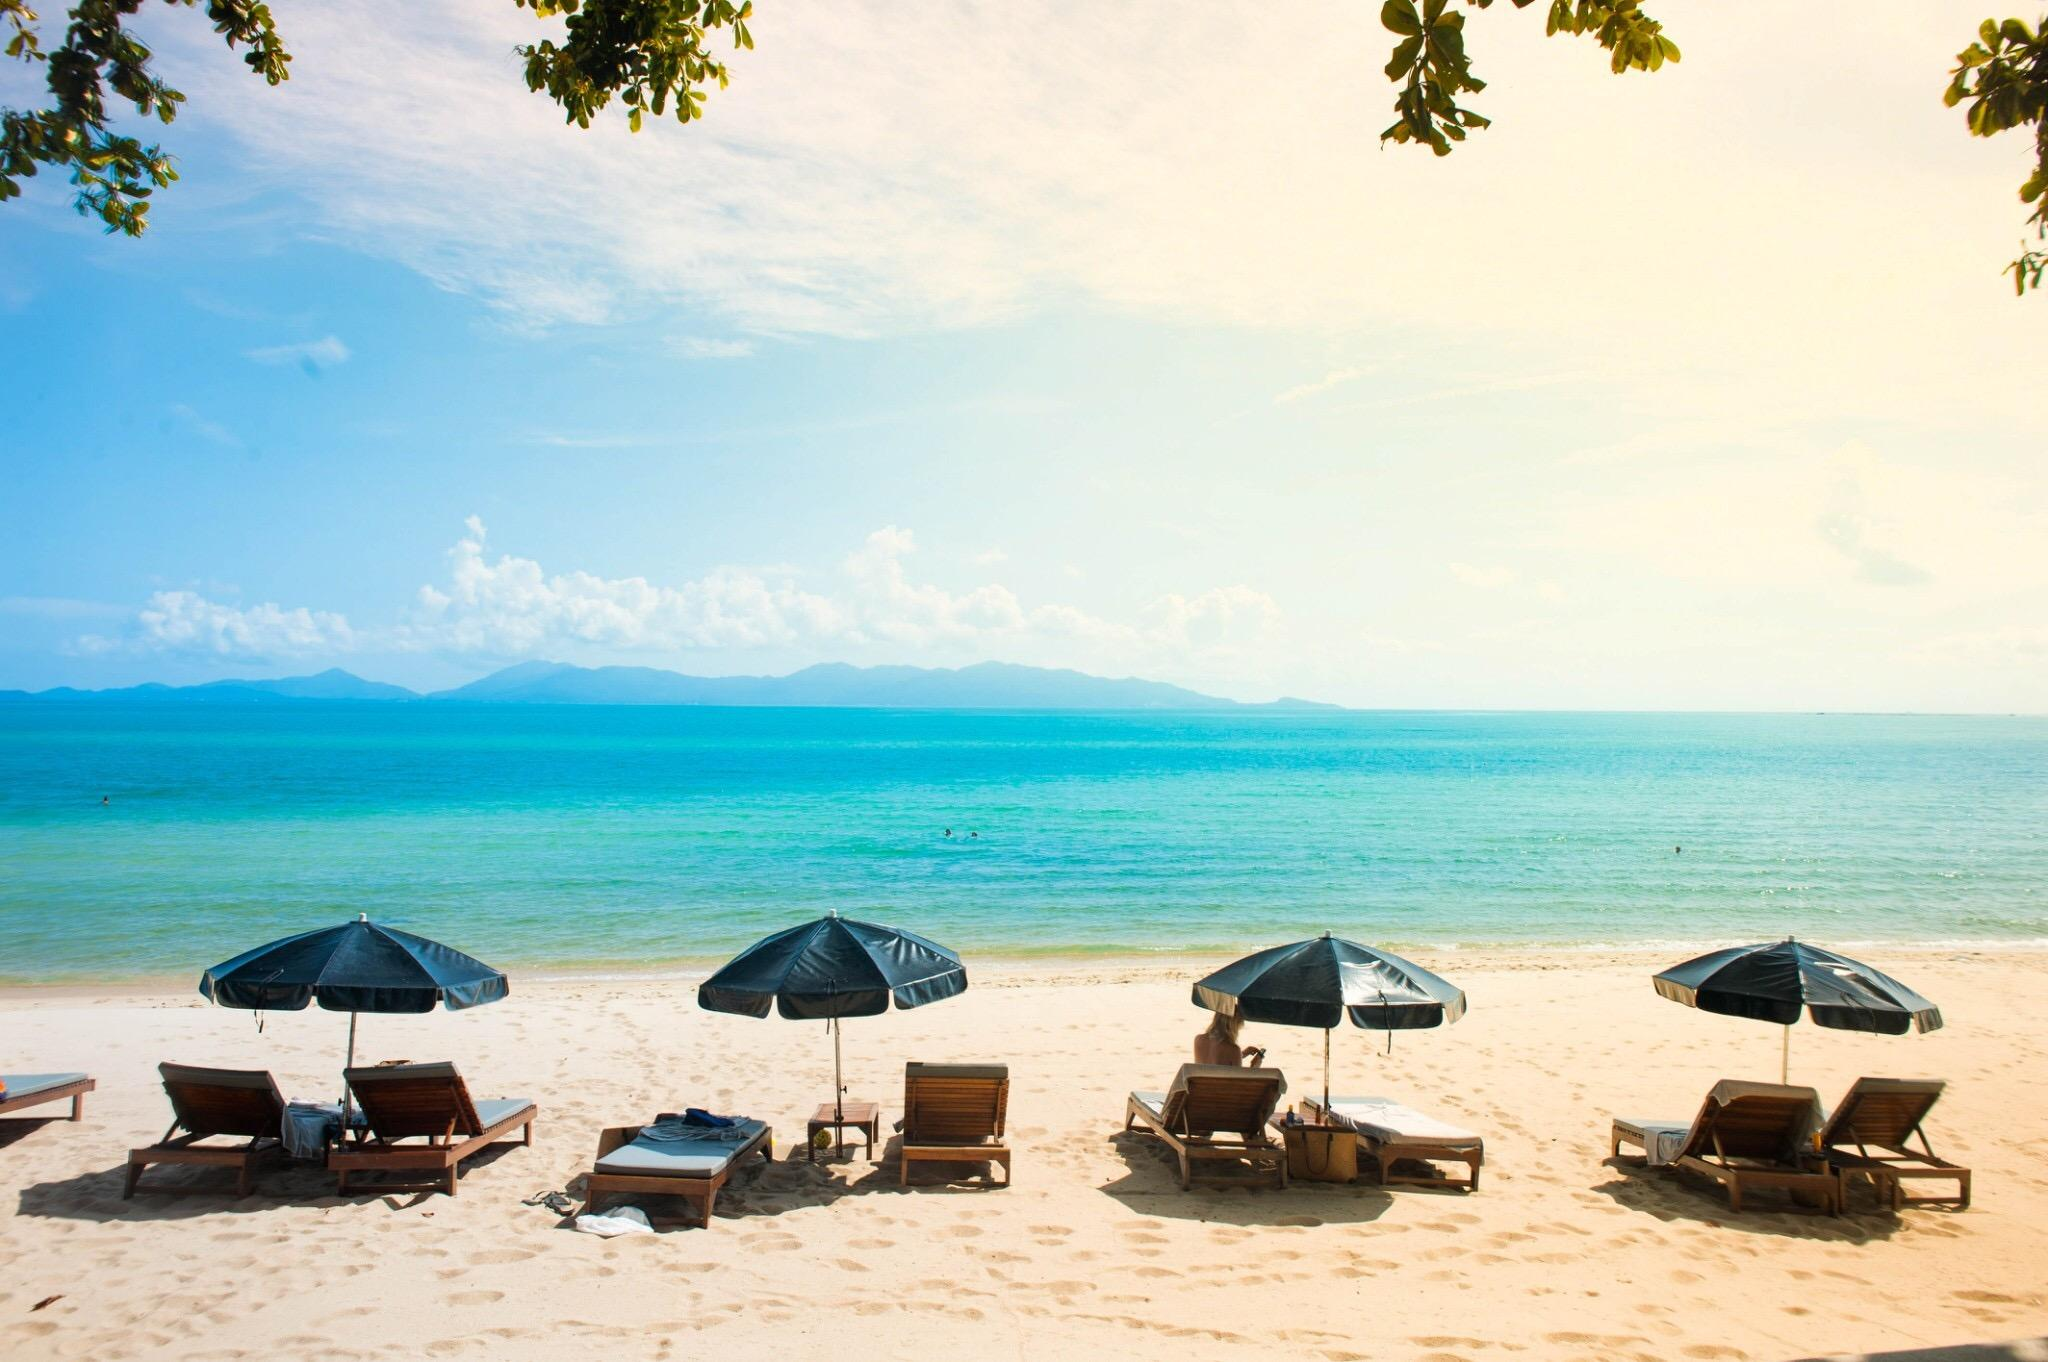 more about the hammock samui beach resort best price on the hammock samui beach resort in samui   reviews  rh   agoda